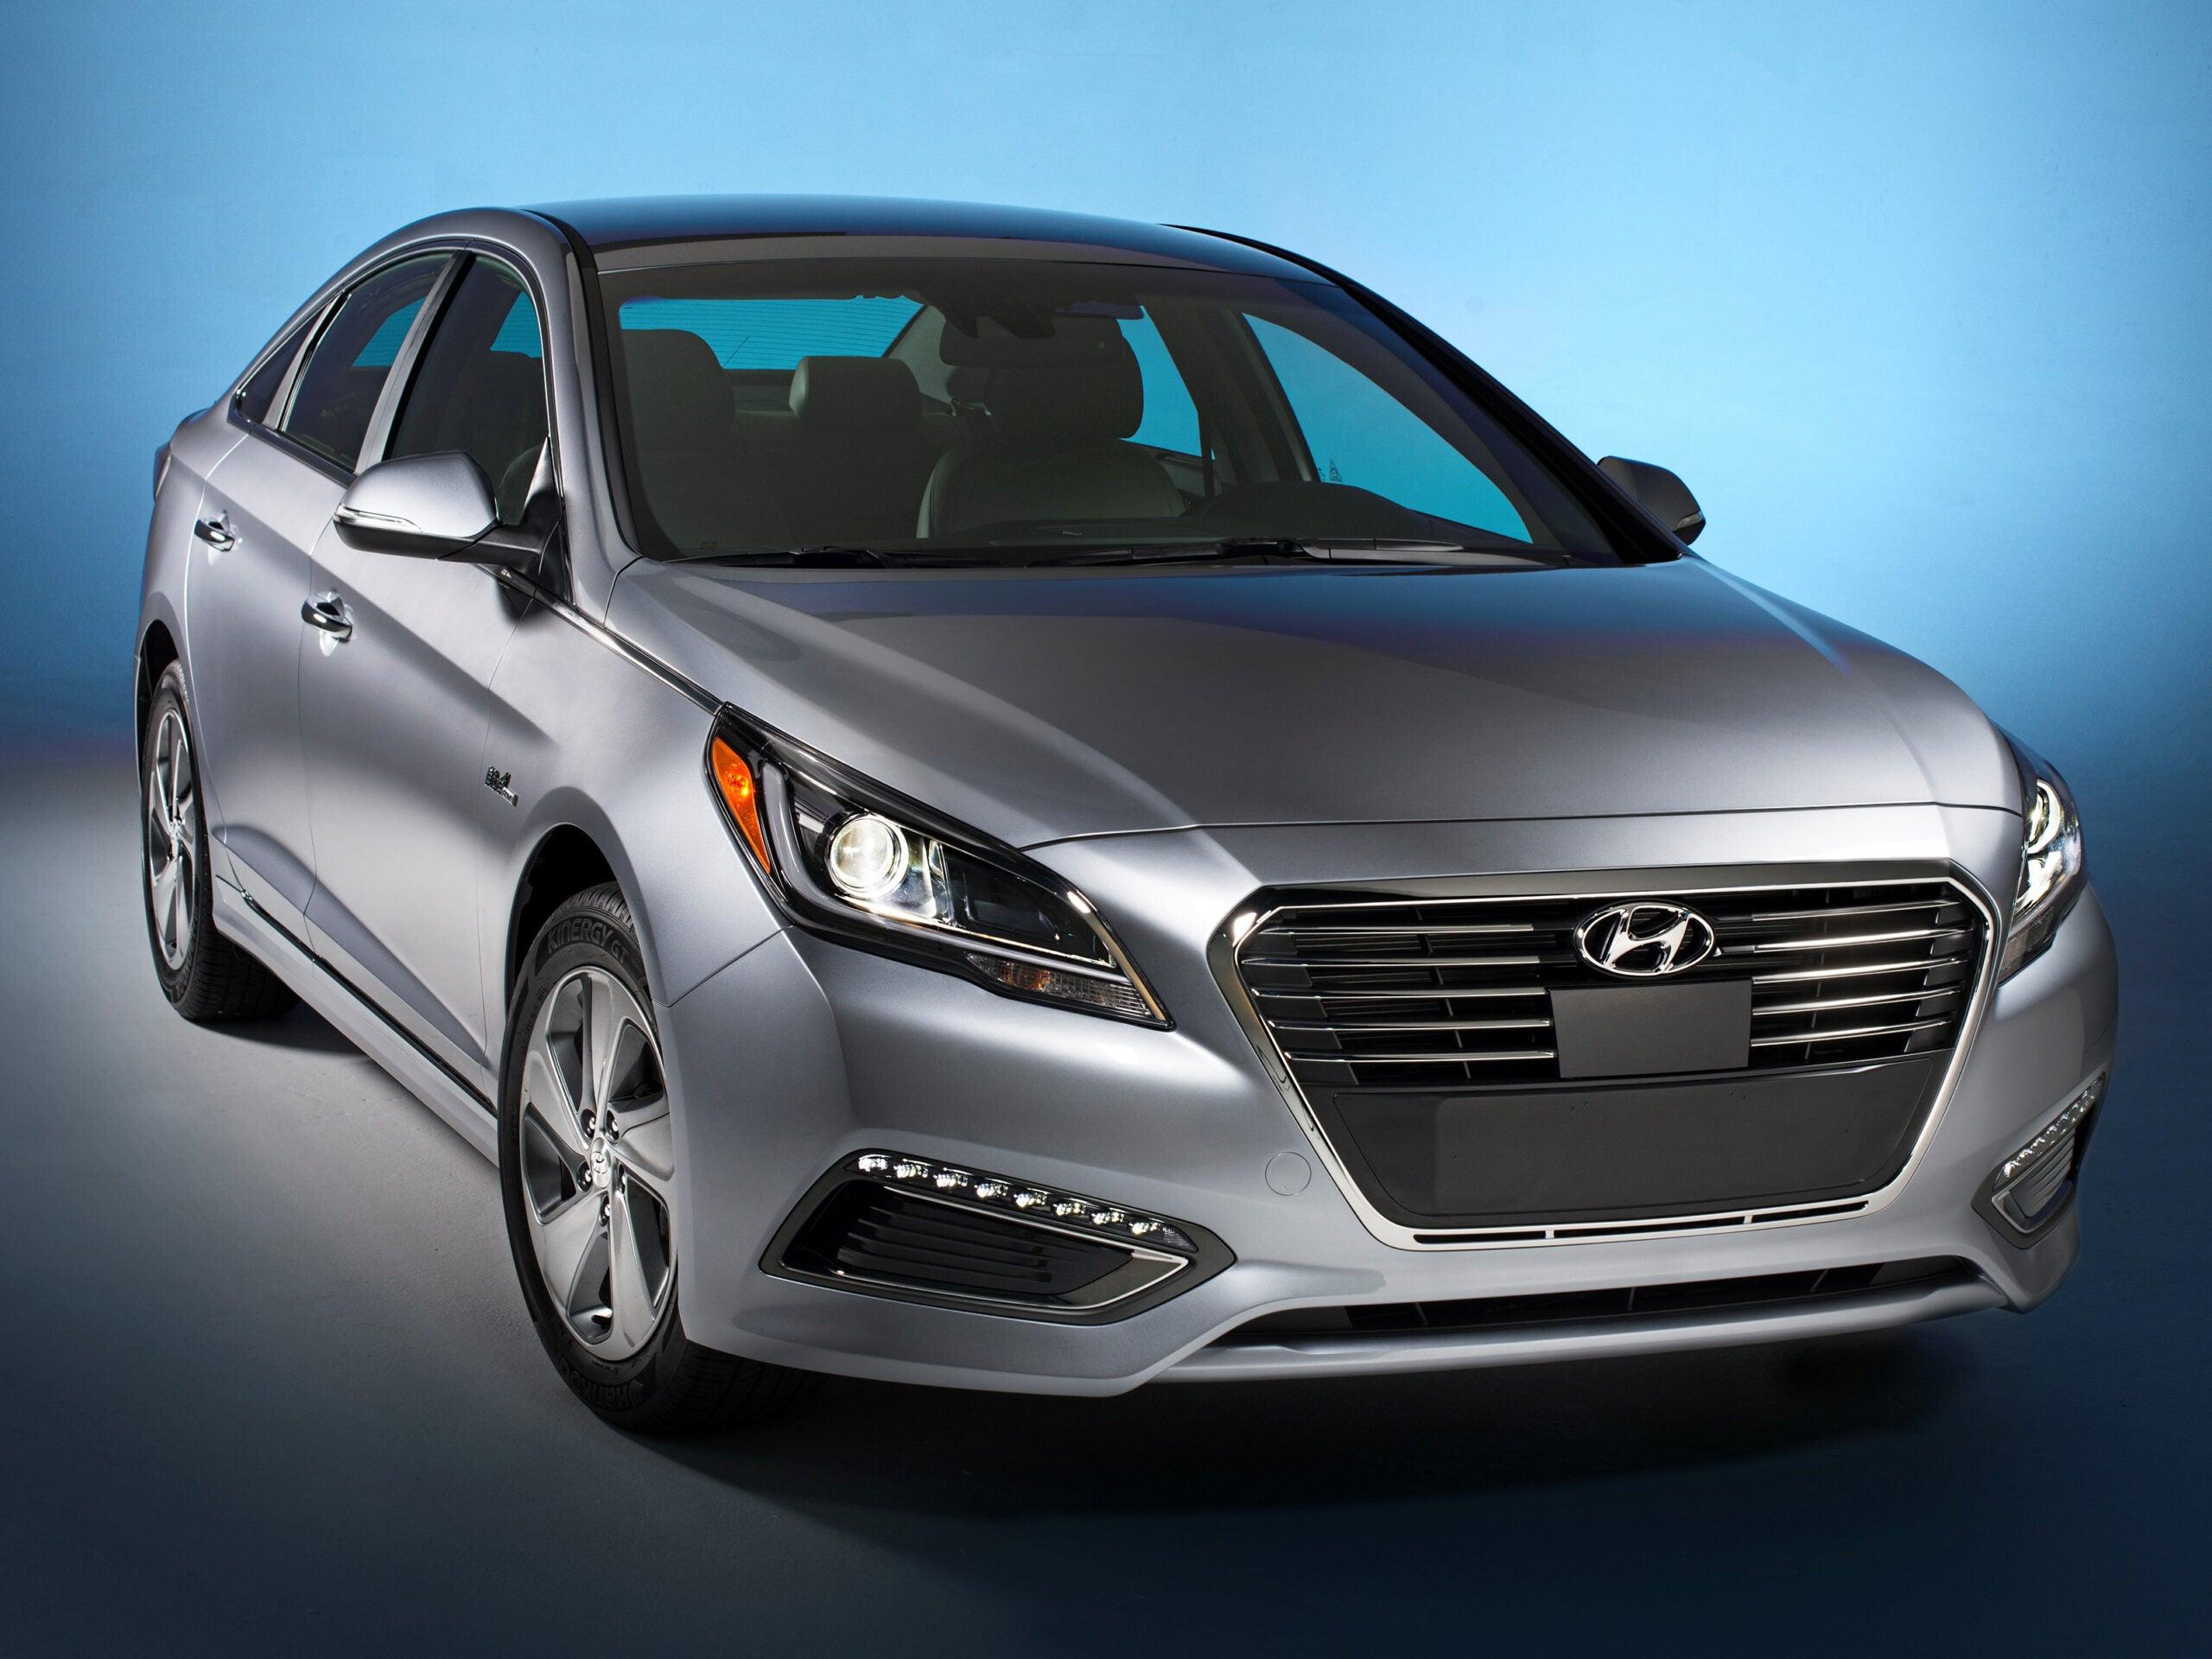 2015 Detroit Auto Show: This Is Hyundai's First Plug-In Hybrid Car